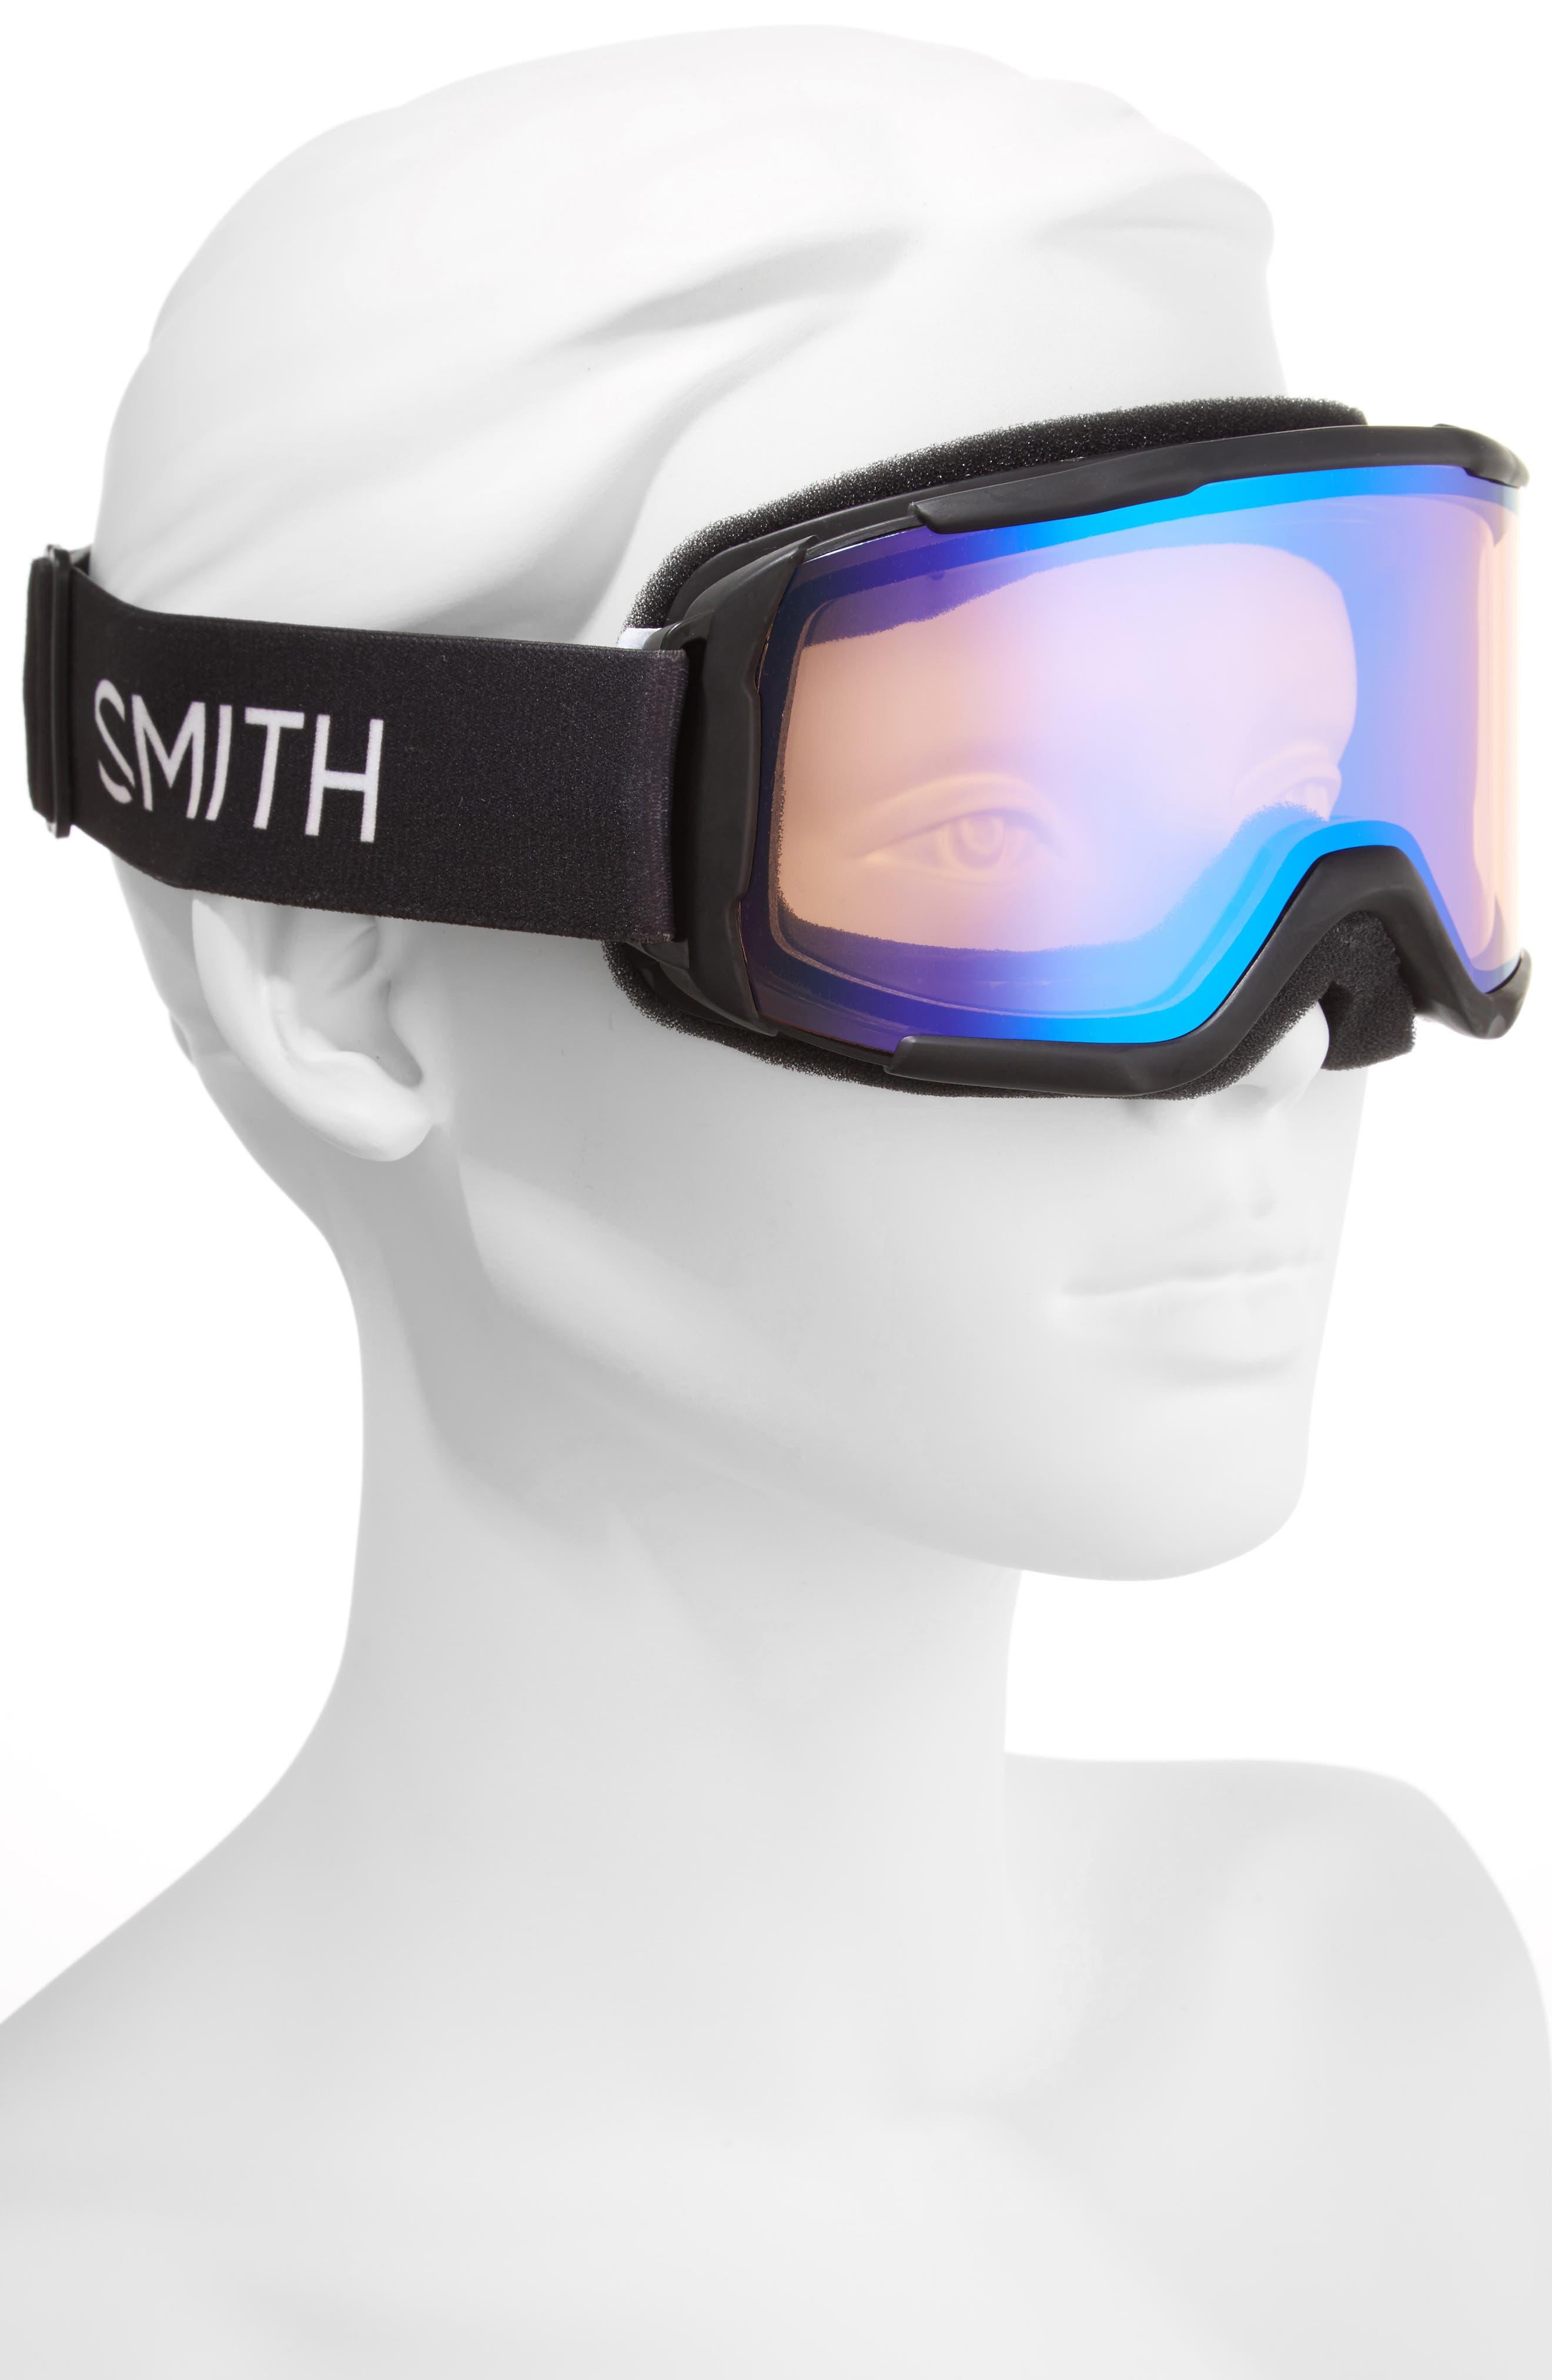 Daredevil 175mm Snow Goggles,                             Alternate thumbnail 2, color,                             BLACK/ MIRROR